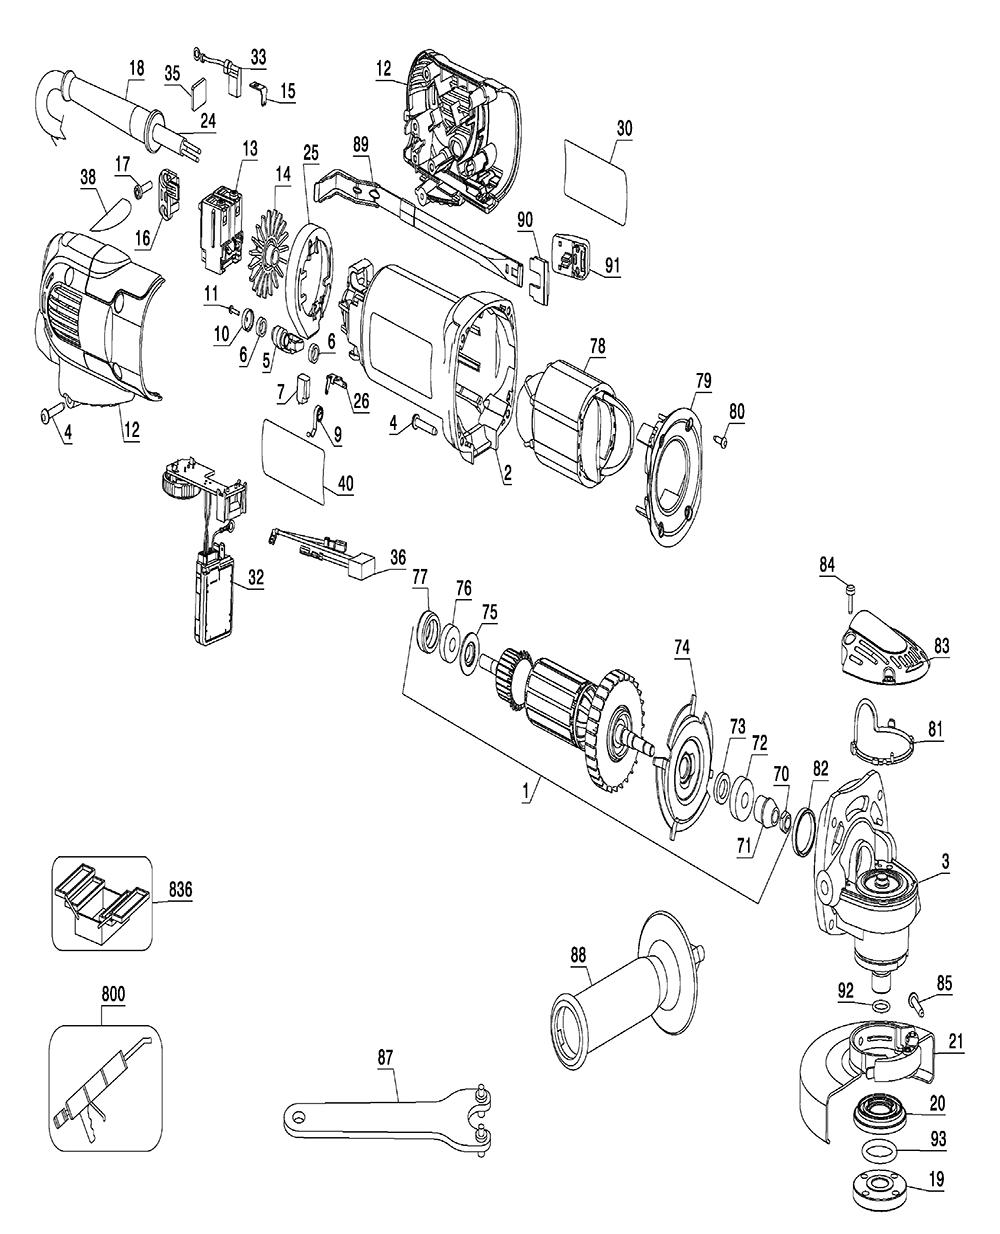 Buy Dewalt D28136-B2 Type-1 Replacement Tool Parts